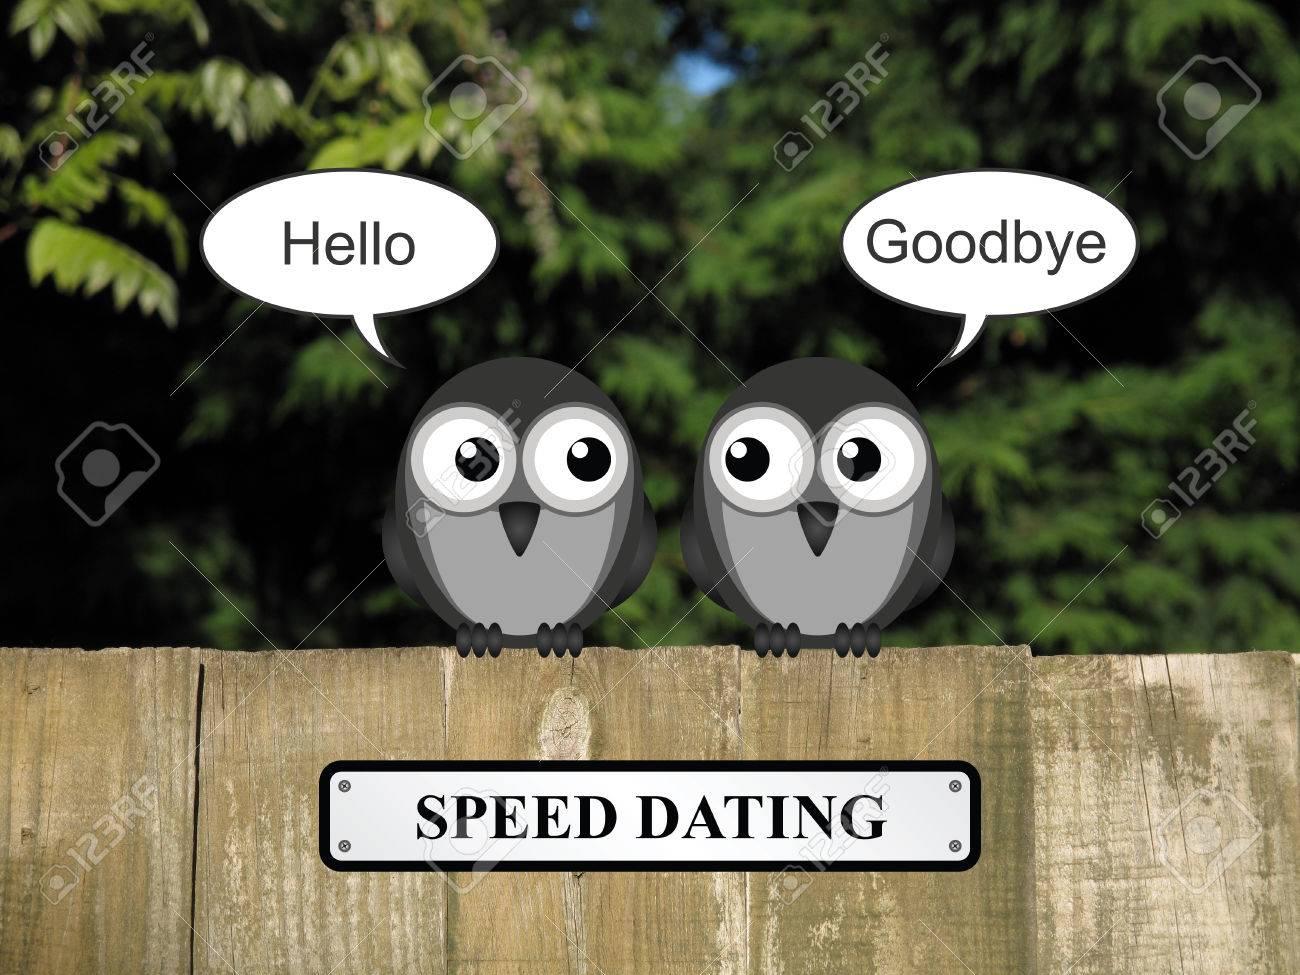 Is rachel mcadams dating anyone